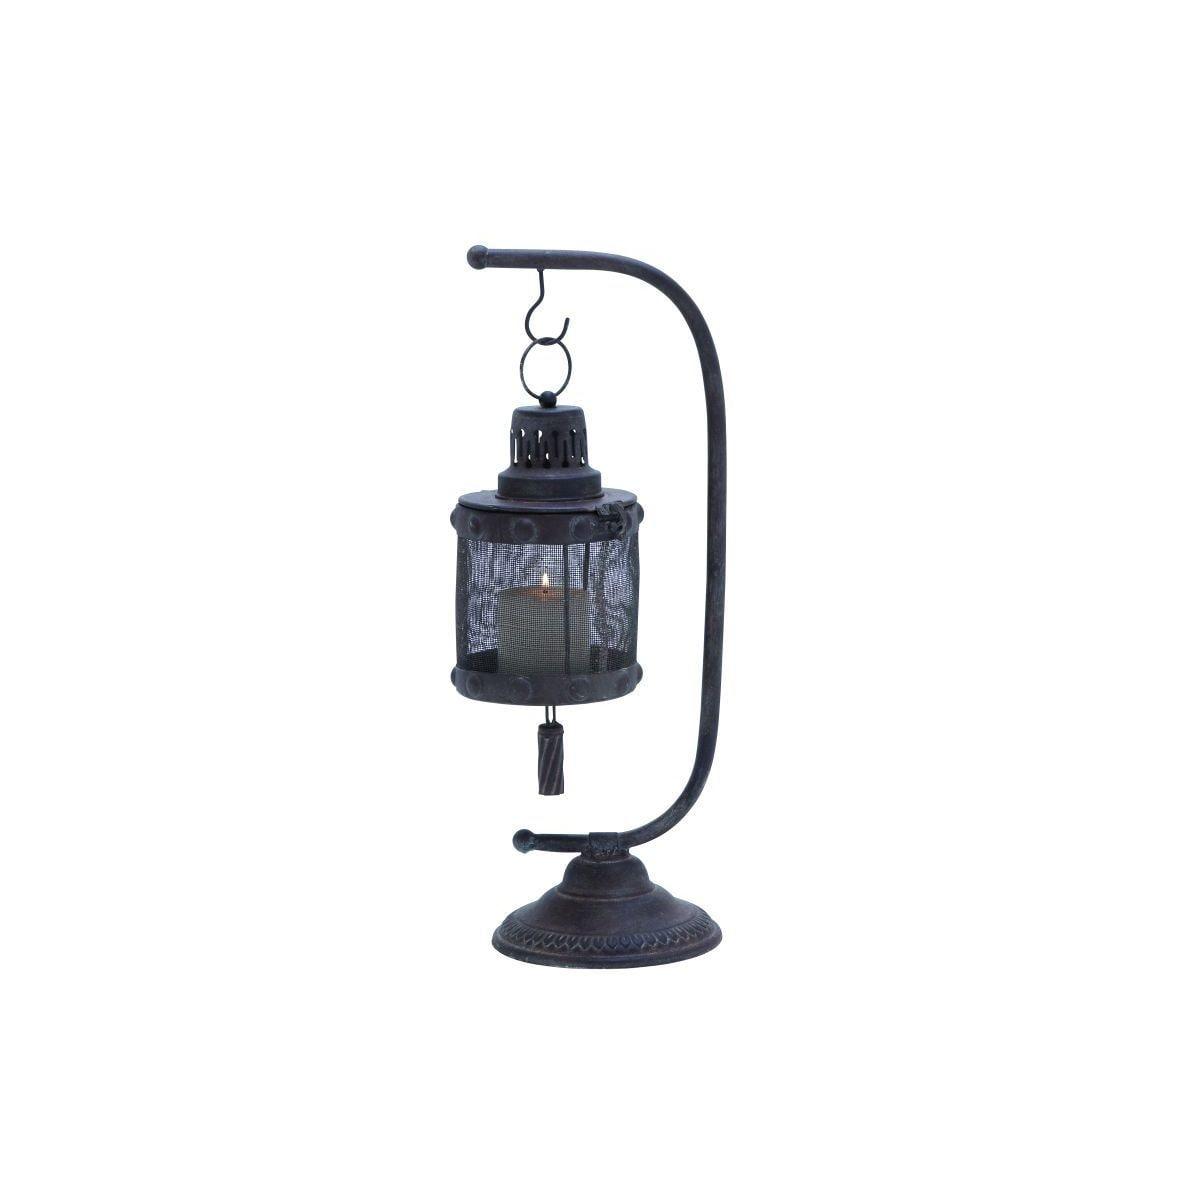 Black Iron Pedestal-style Lantern